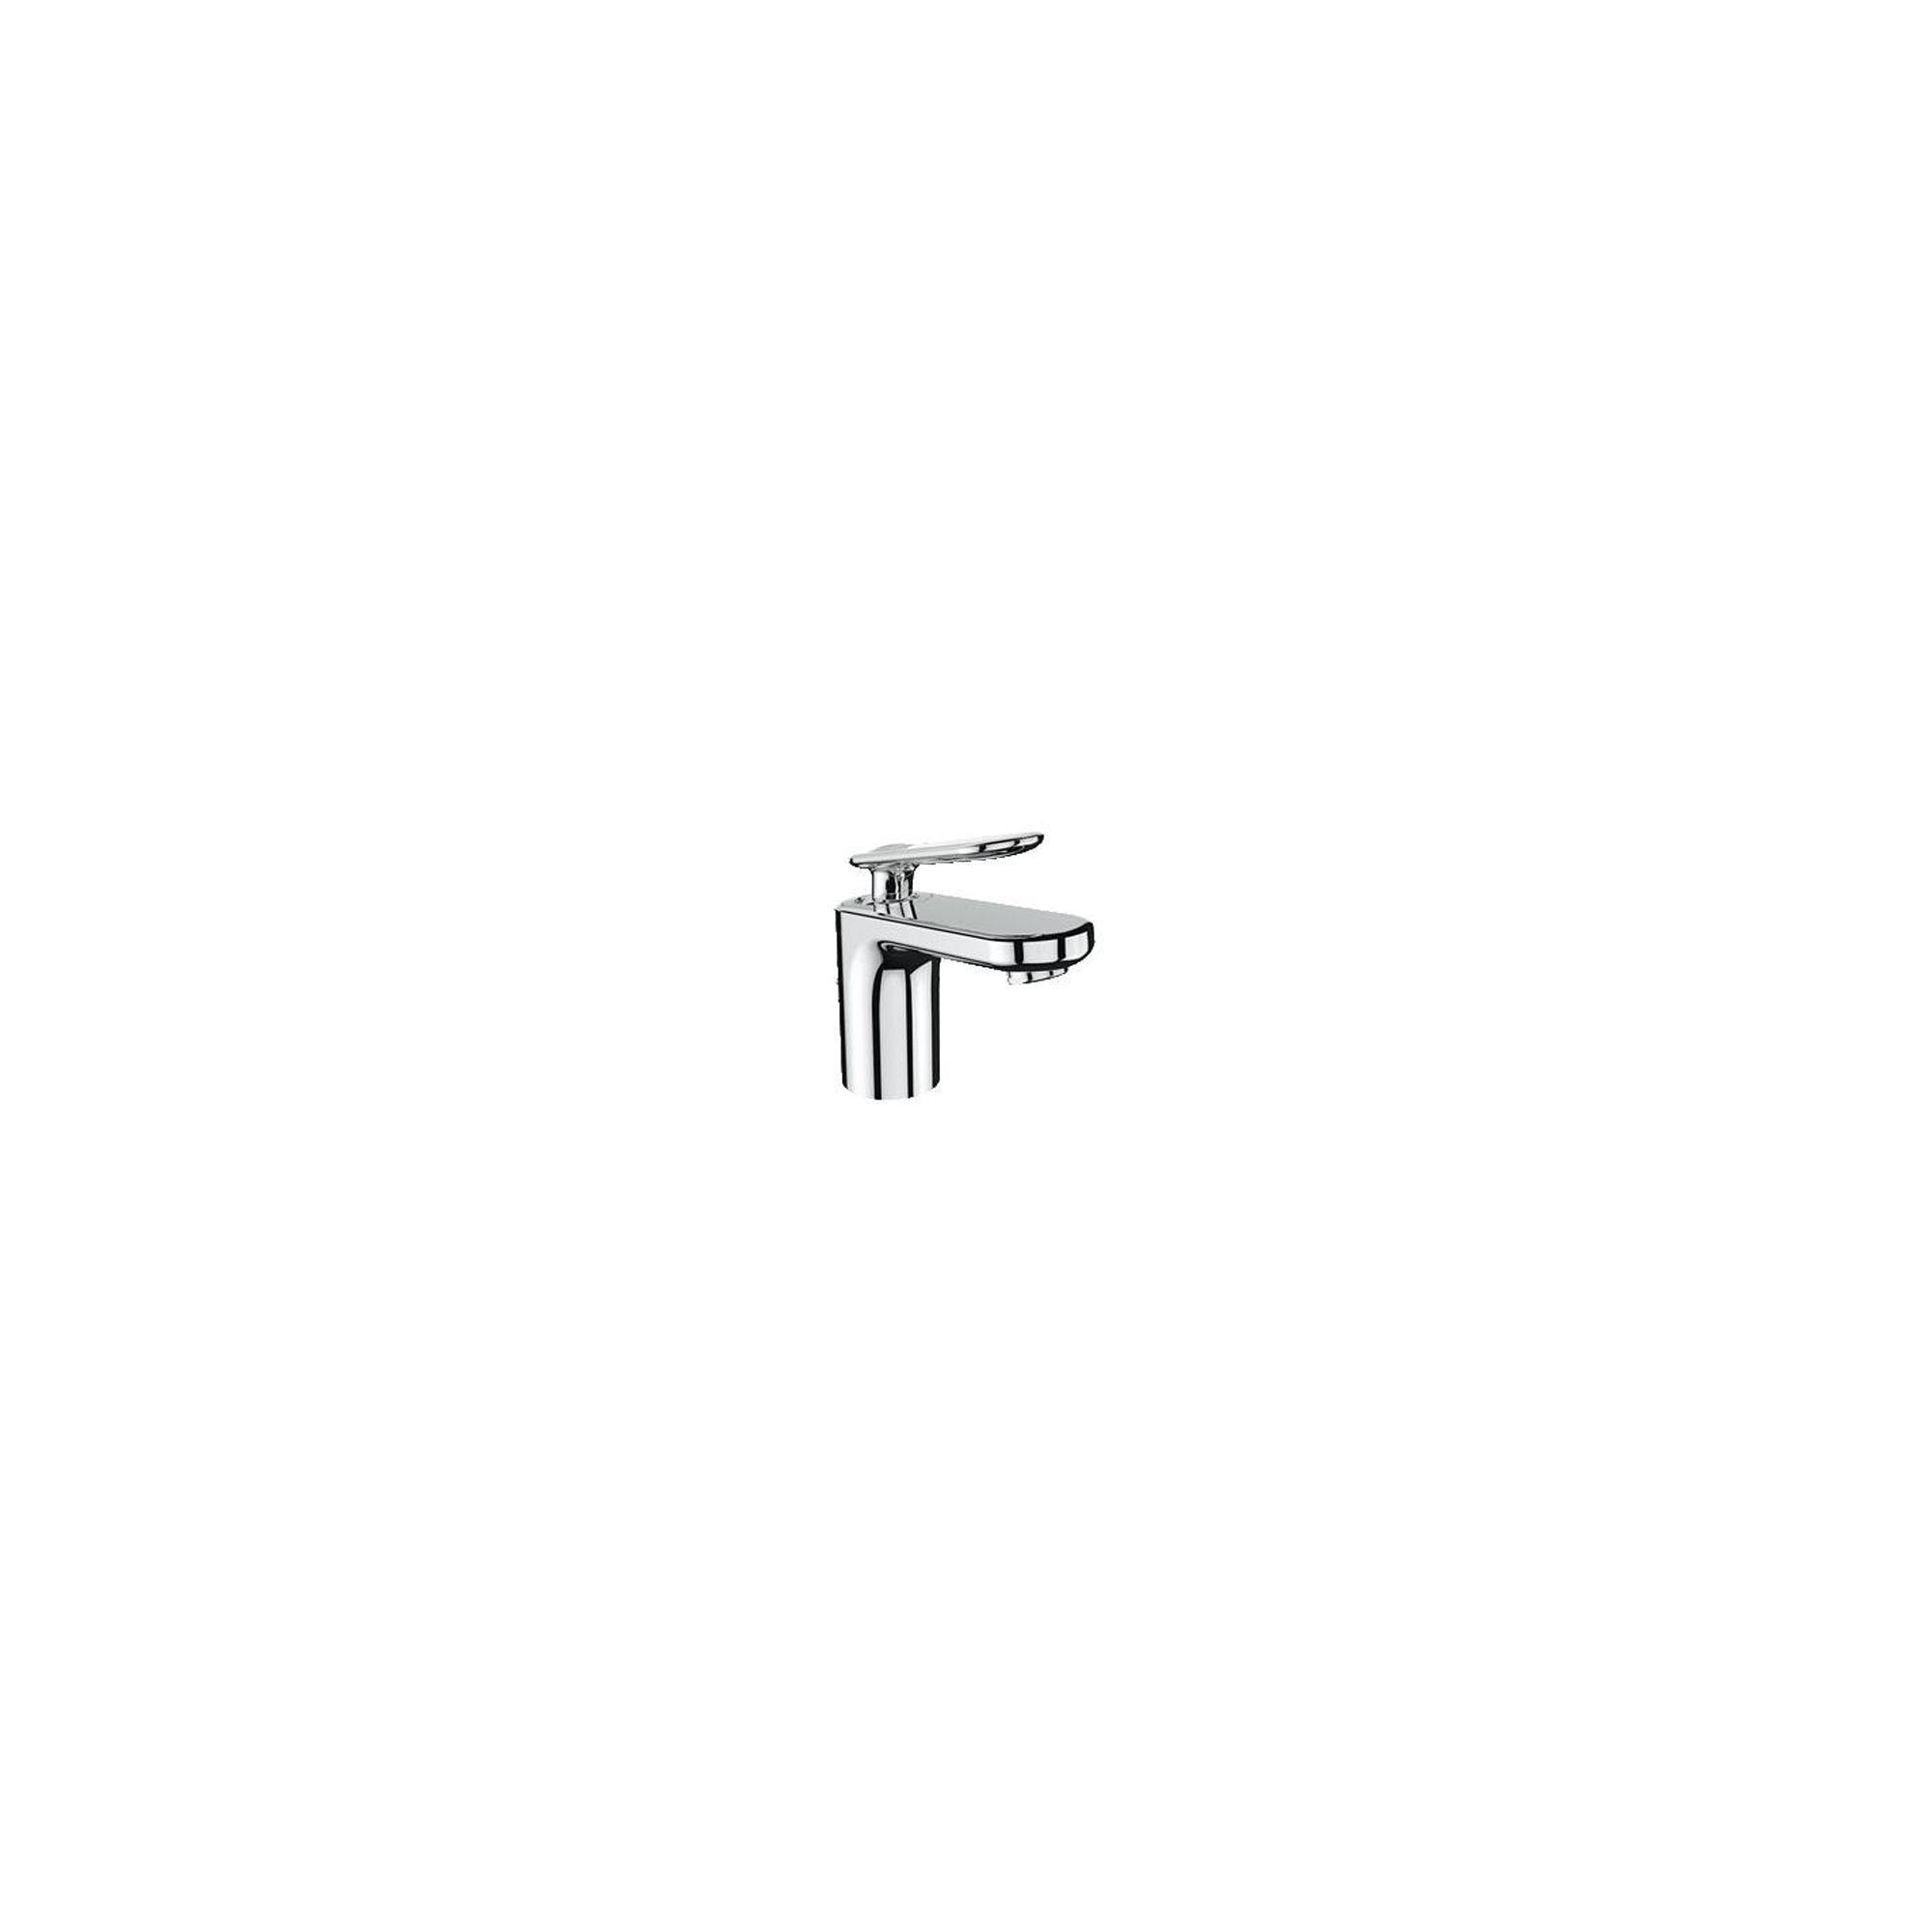 Grohe Ondus Veris Low Spout Mono Basin Mixer Tap, Single Handle, Chrome at Tesco Direct